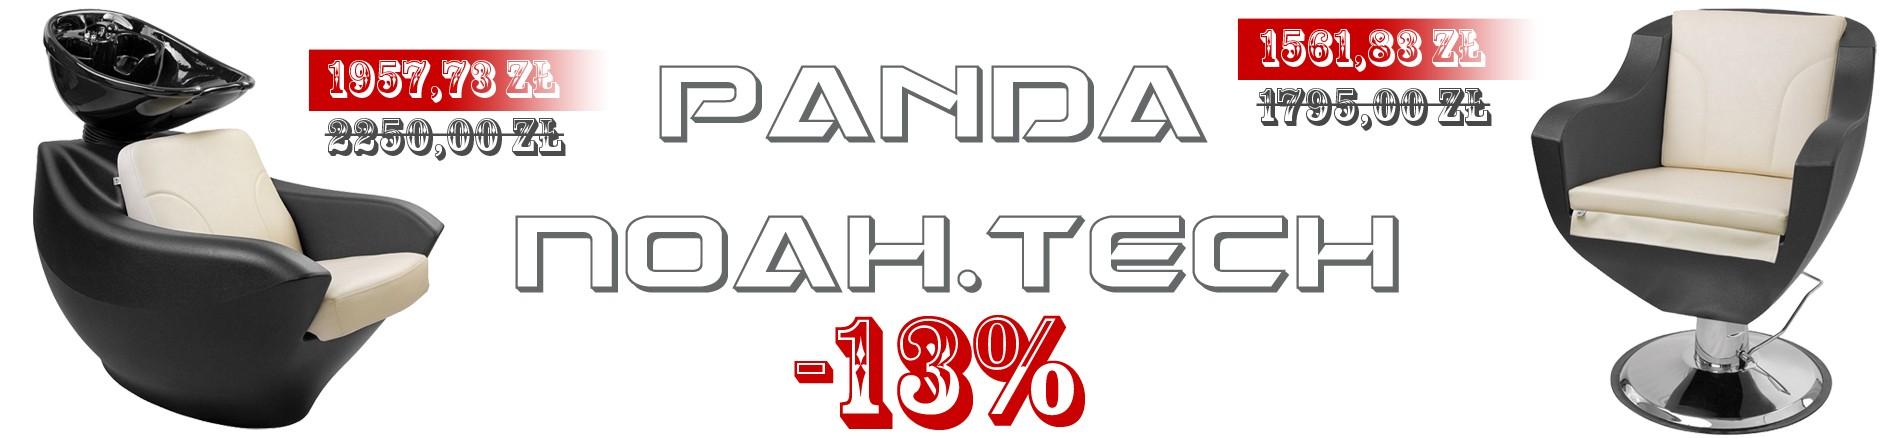 Panda Noah Tech